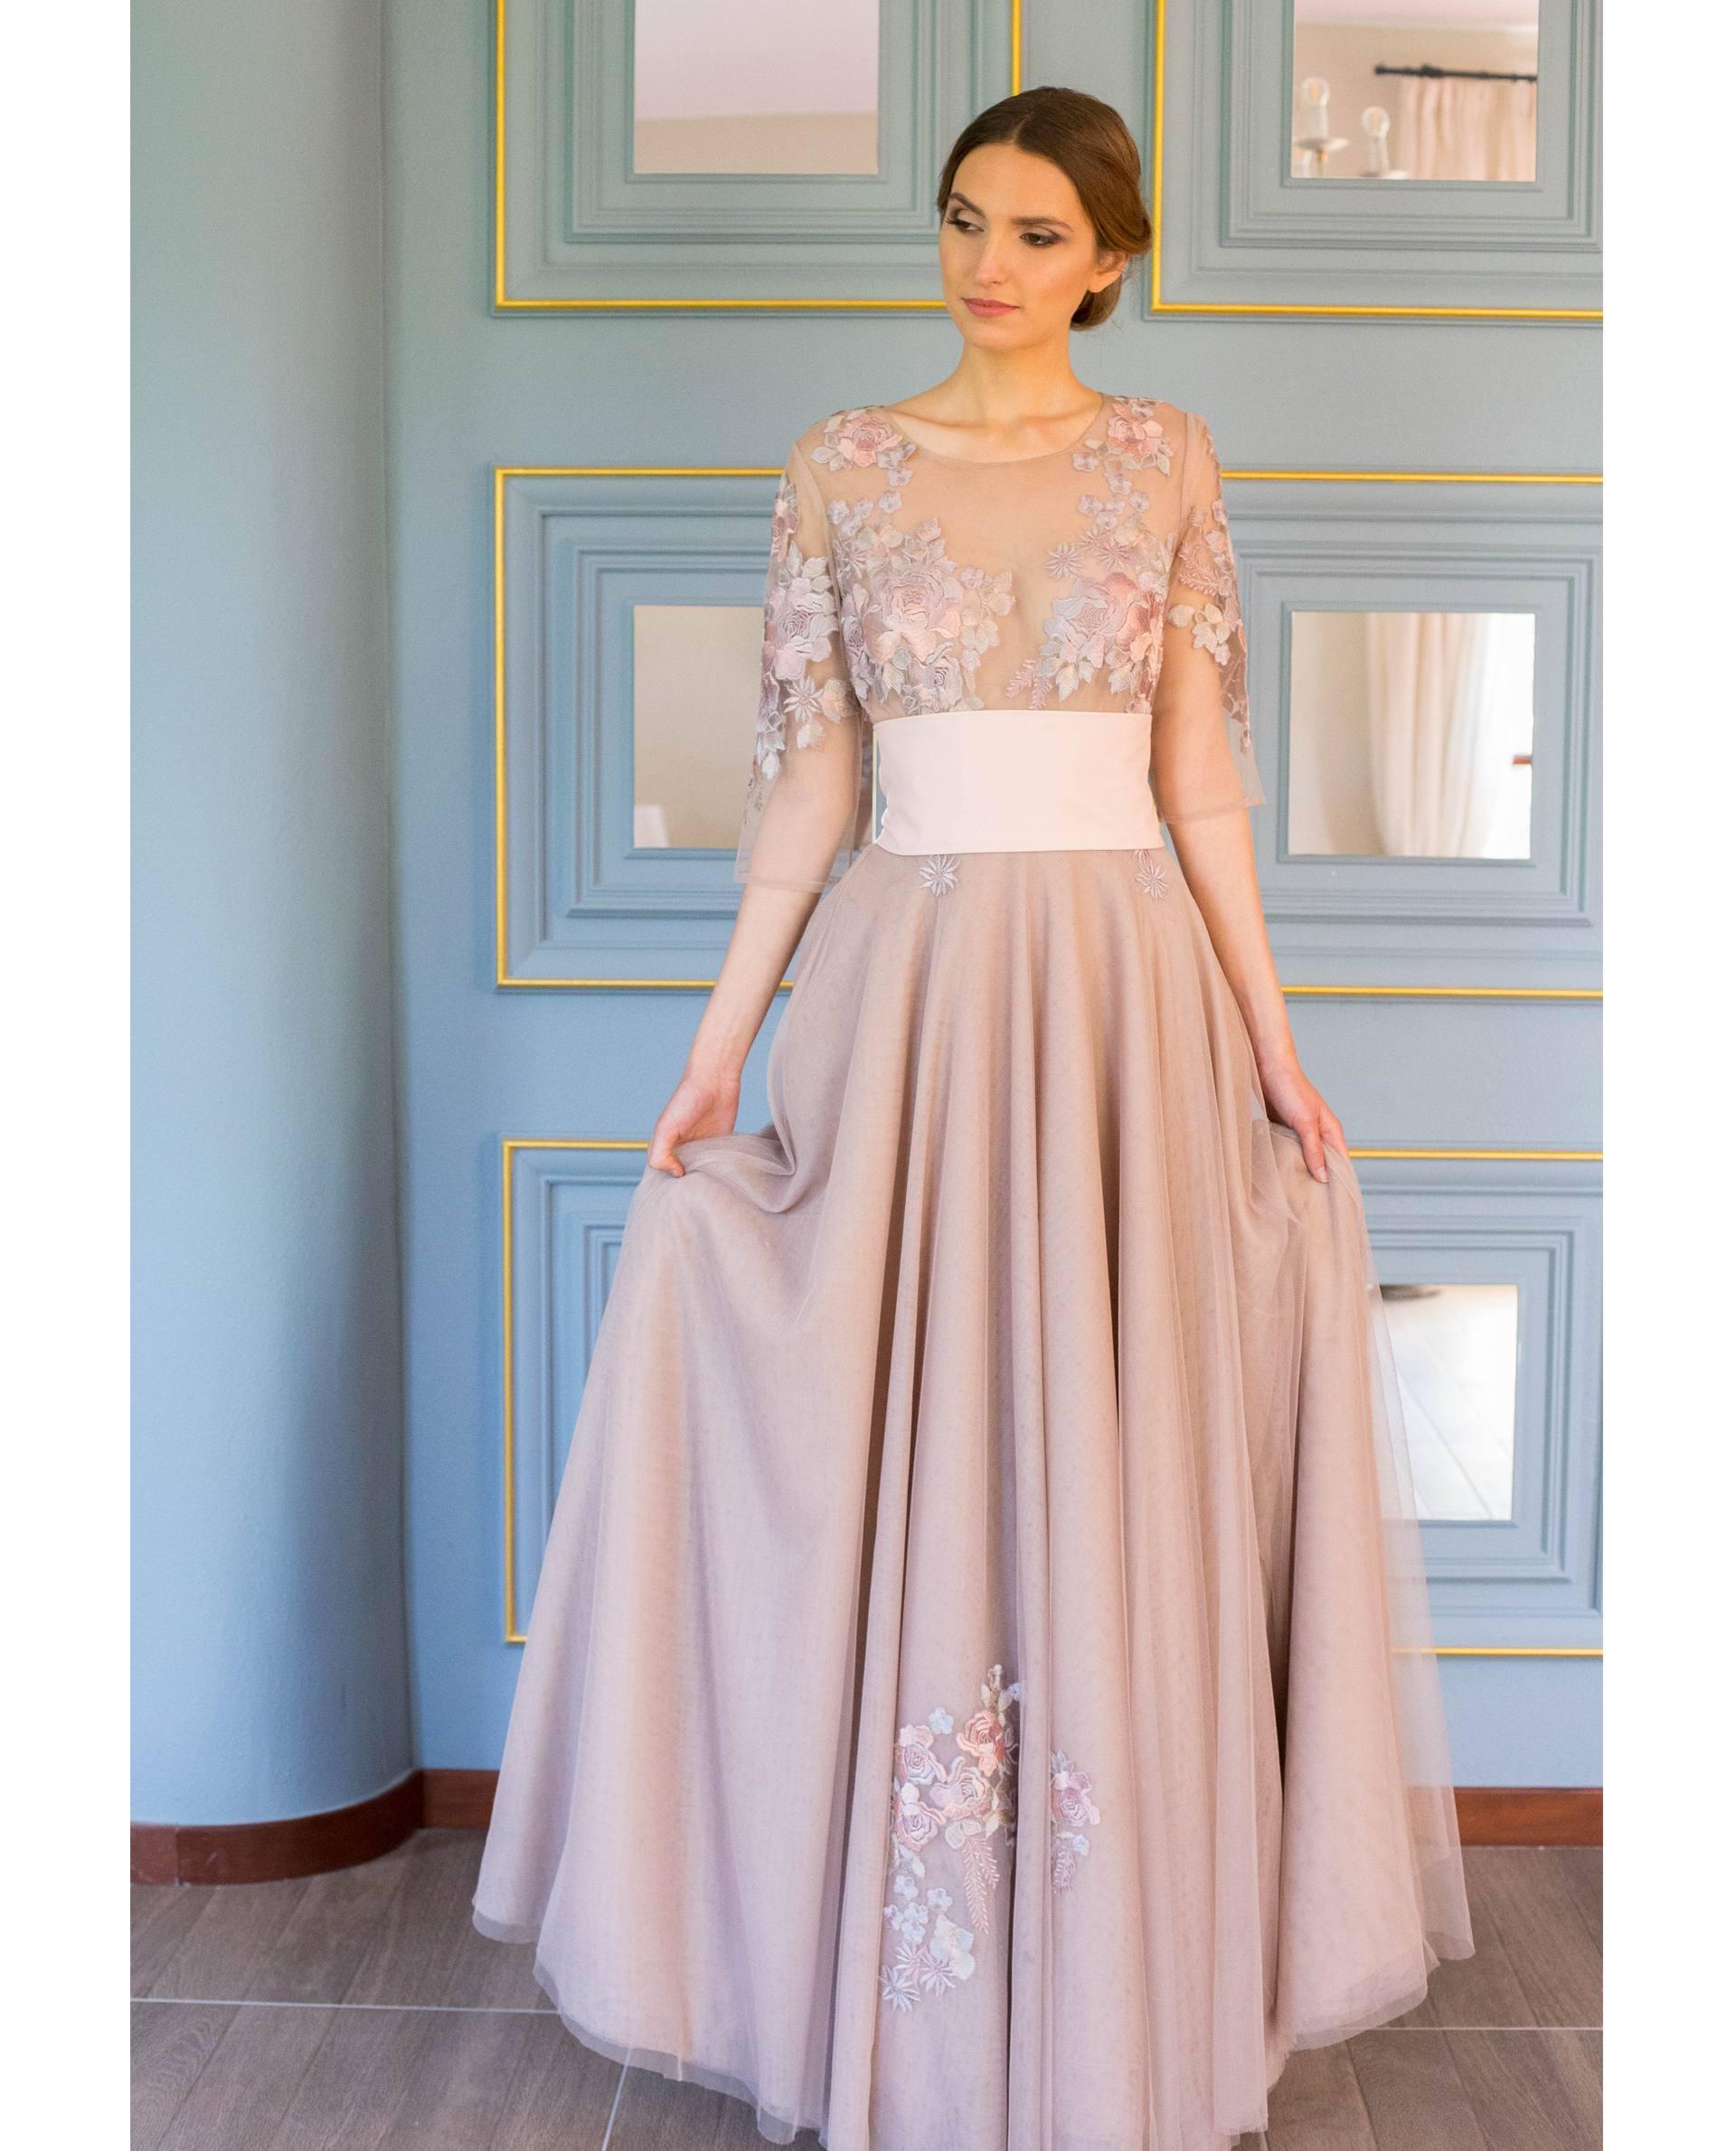 ATELIER-NATURE 2019 - VESTIDOS - vestido fiesta RANIA rosa palo